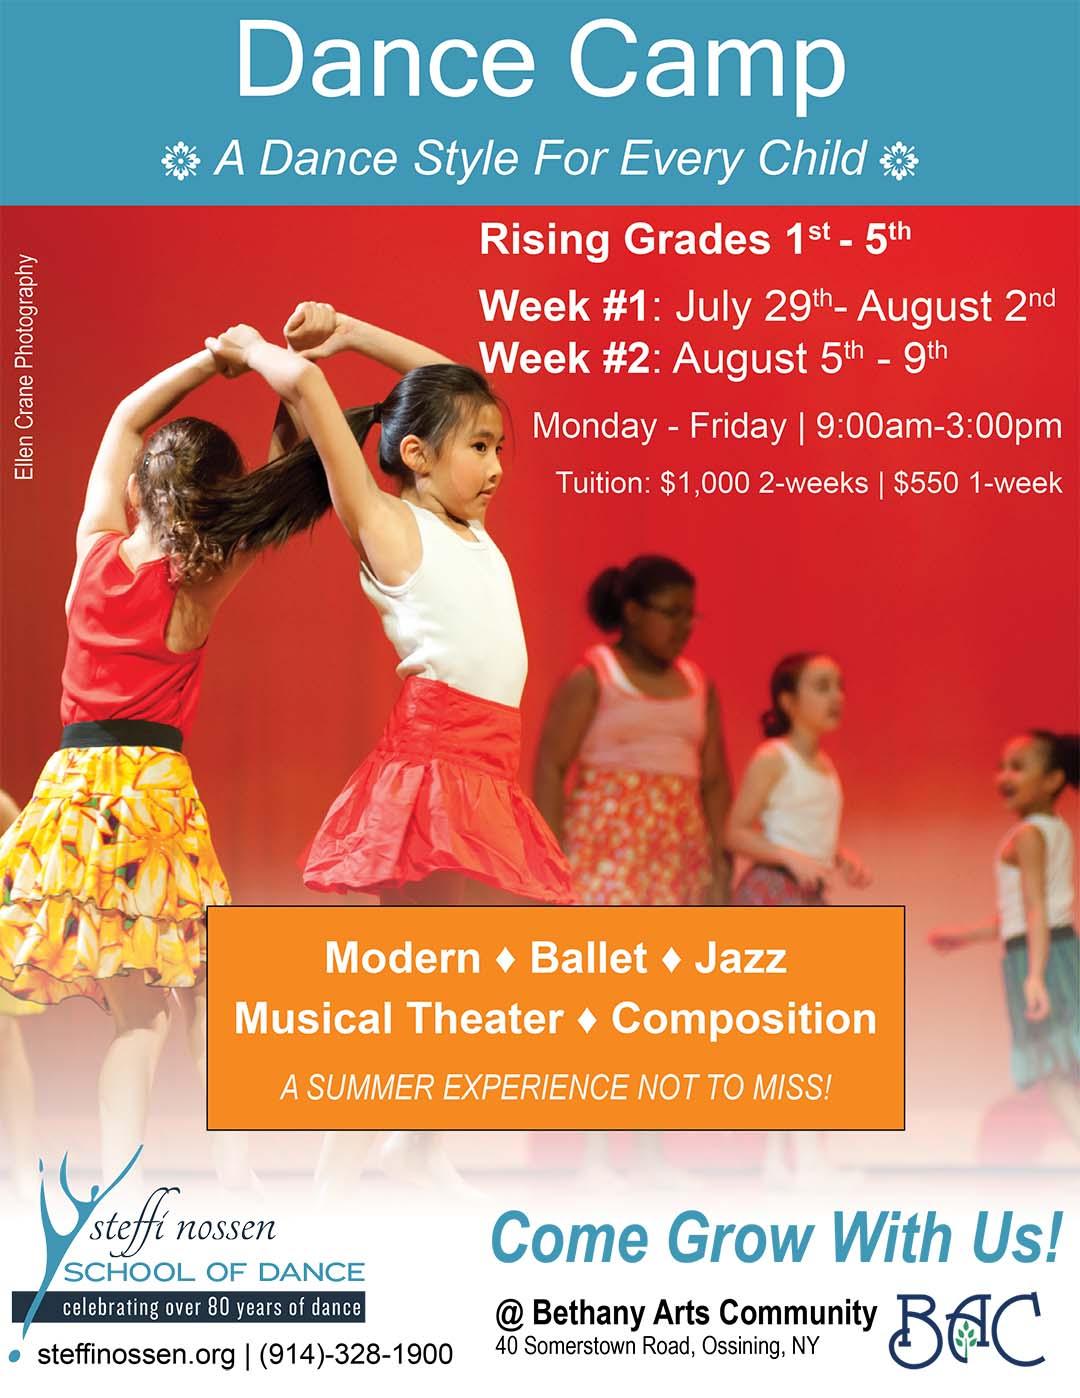 Steffi Nossen's Dance Camp